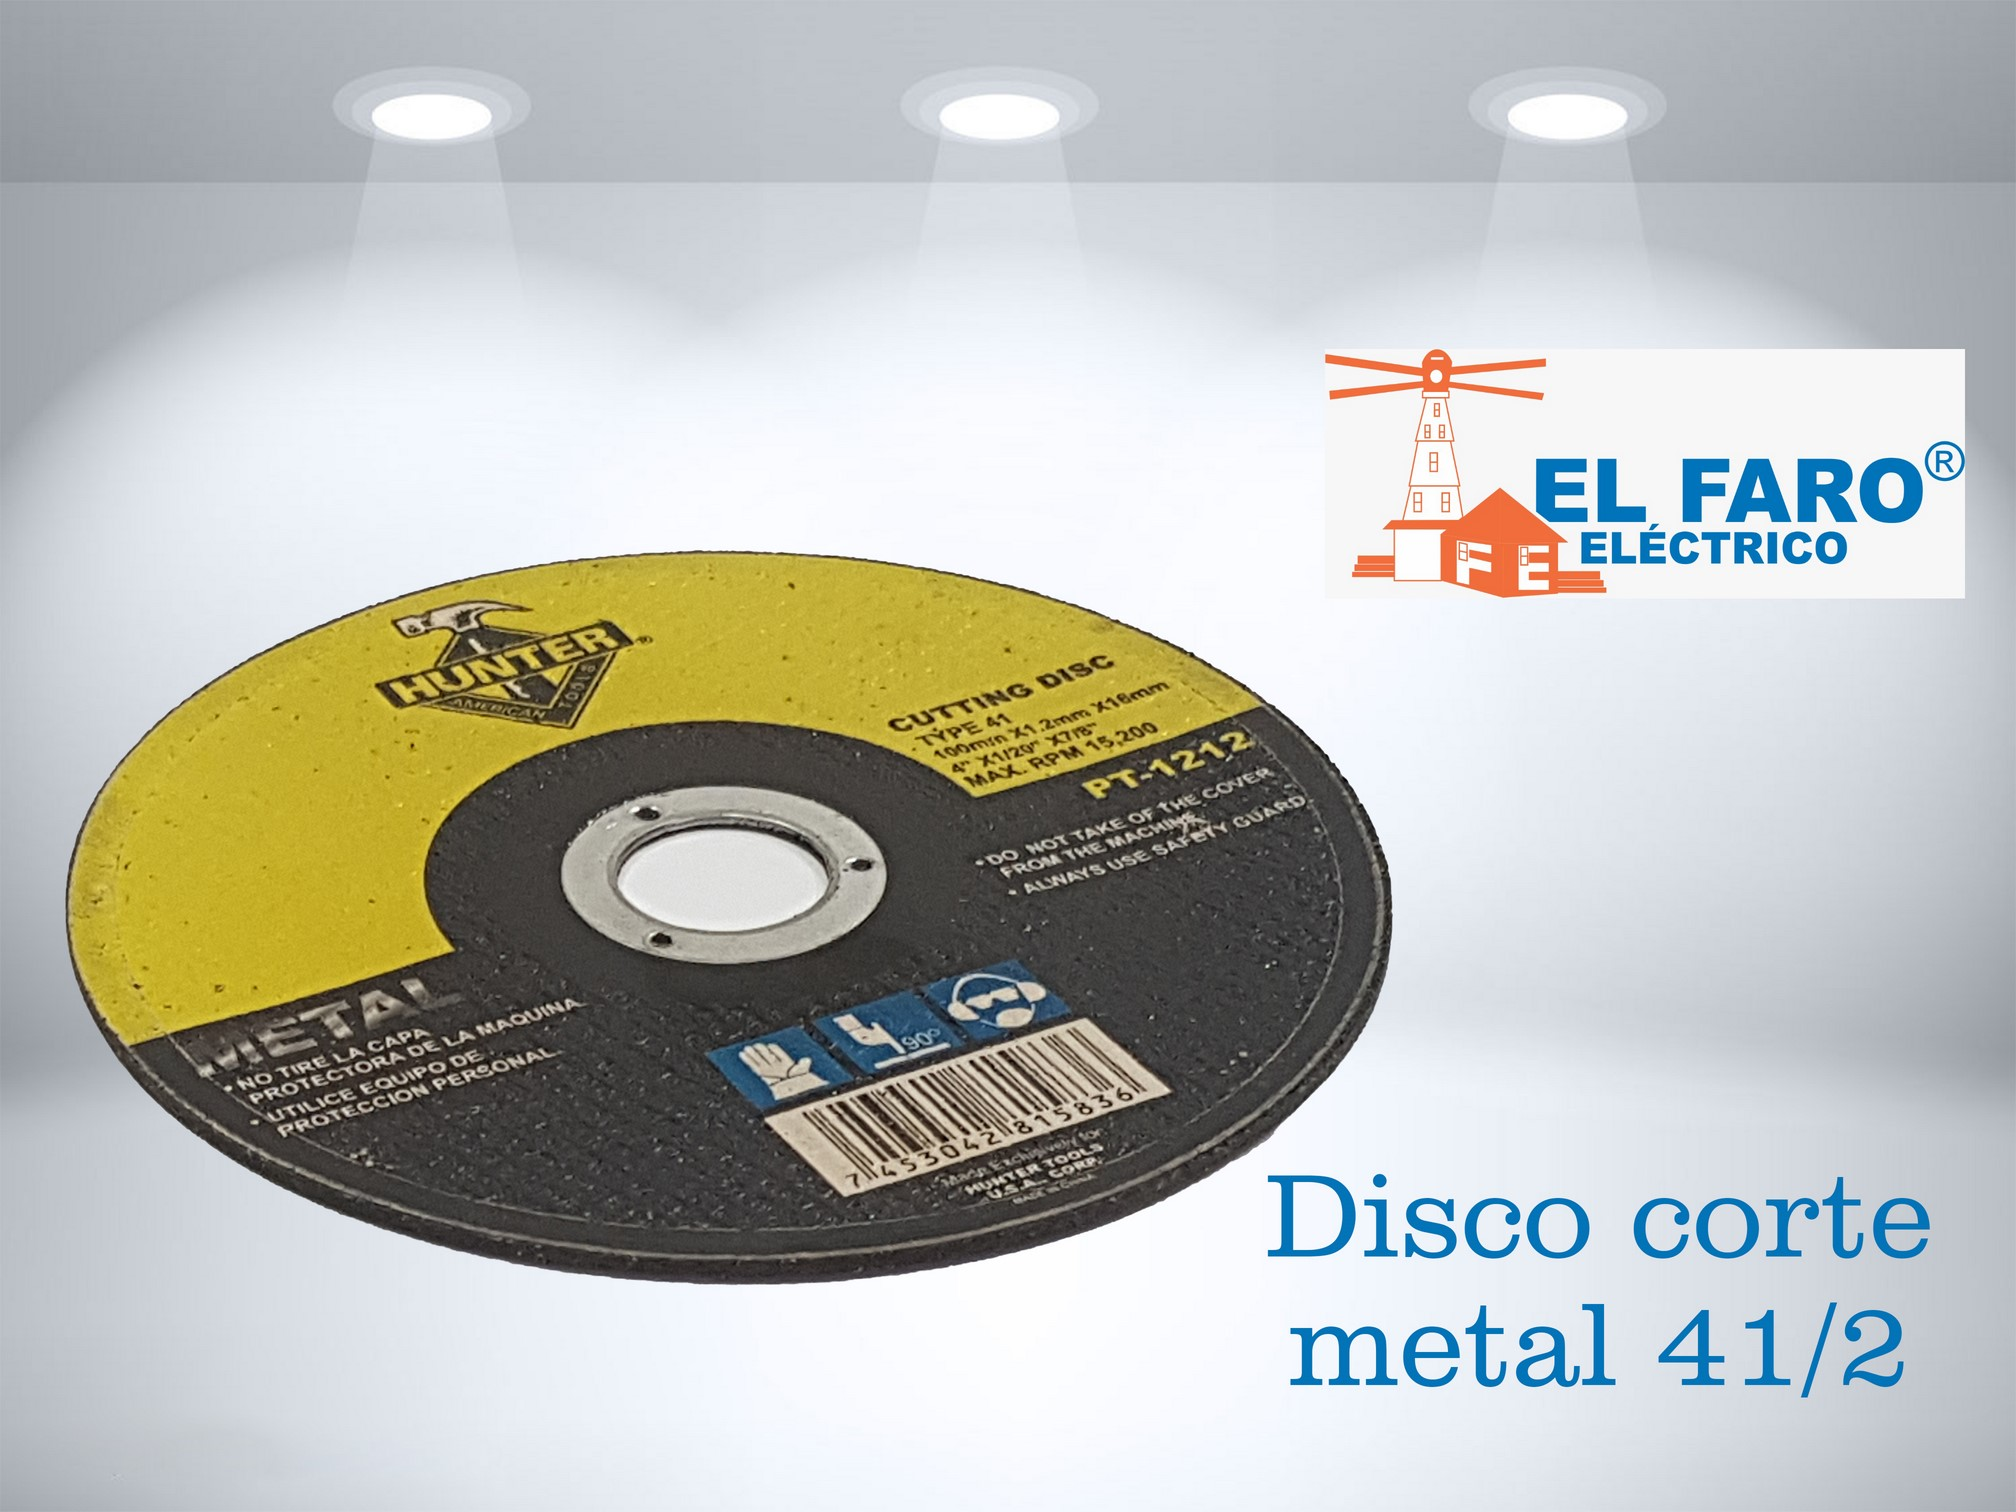 Disco corte metal 41/2